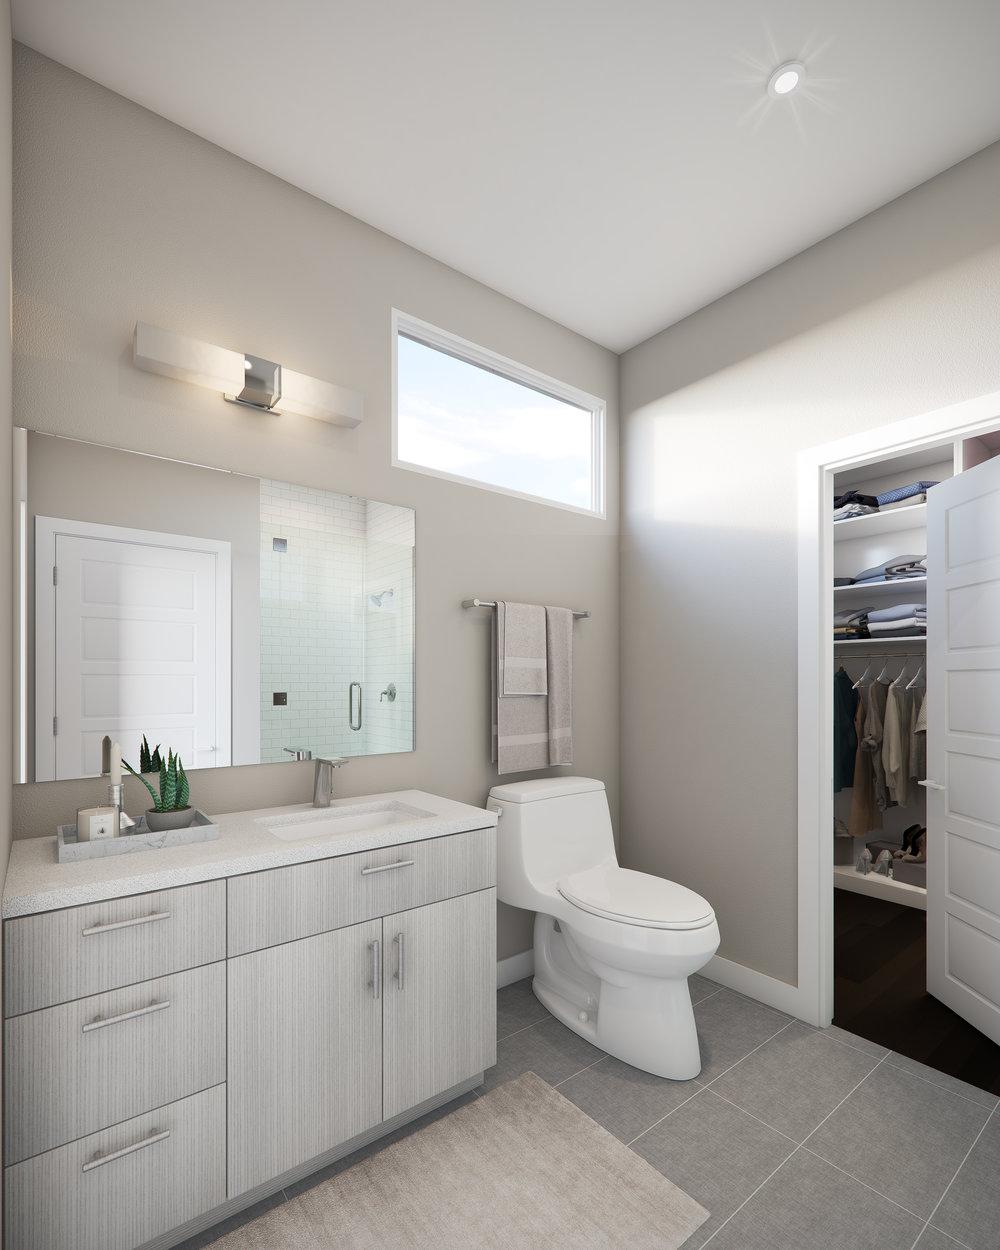 170628_StoneAcre_1306West_Bathroom Interior.jpg